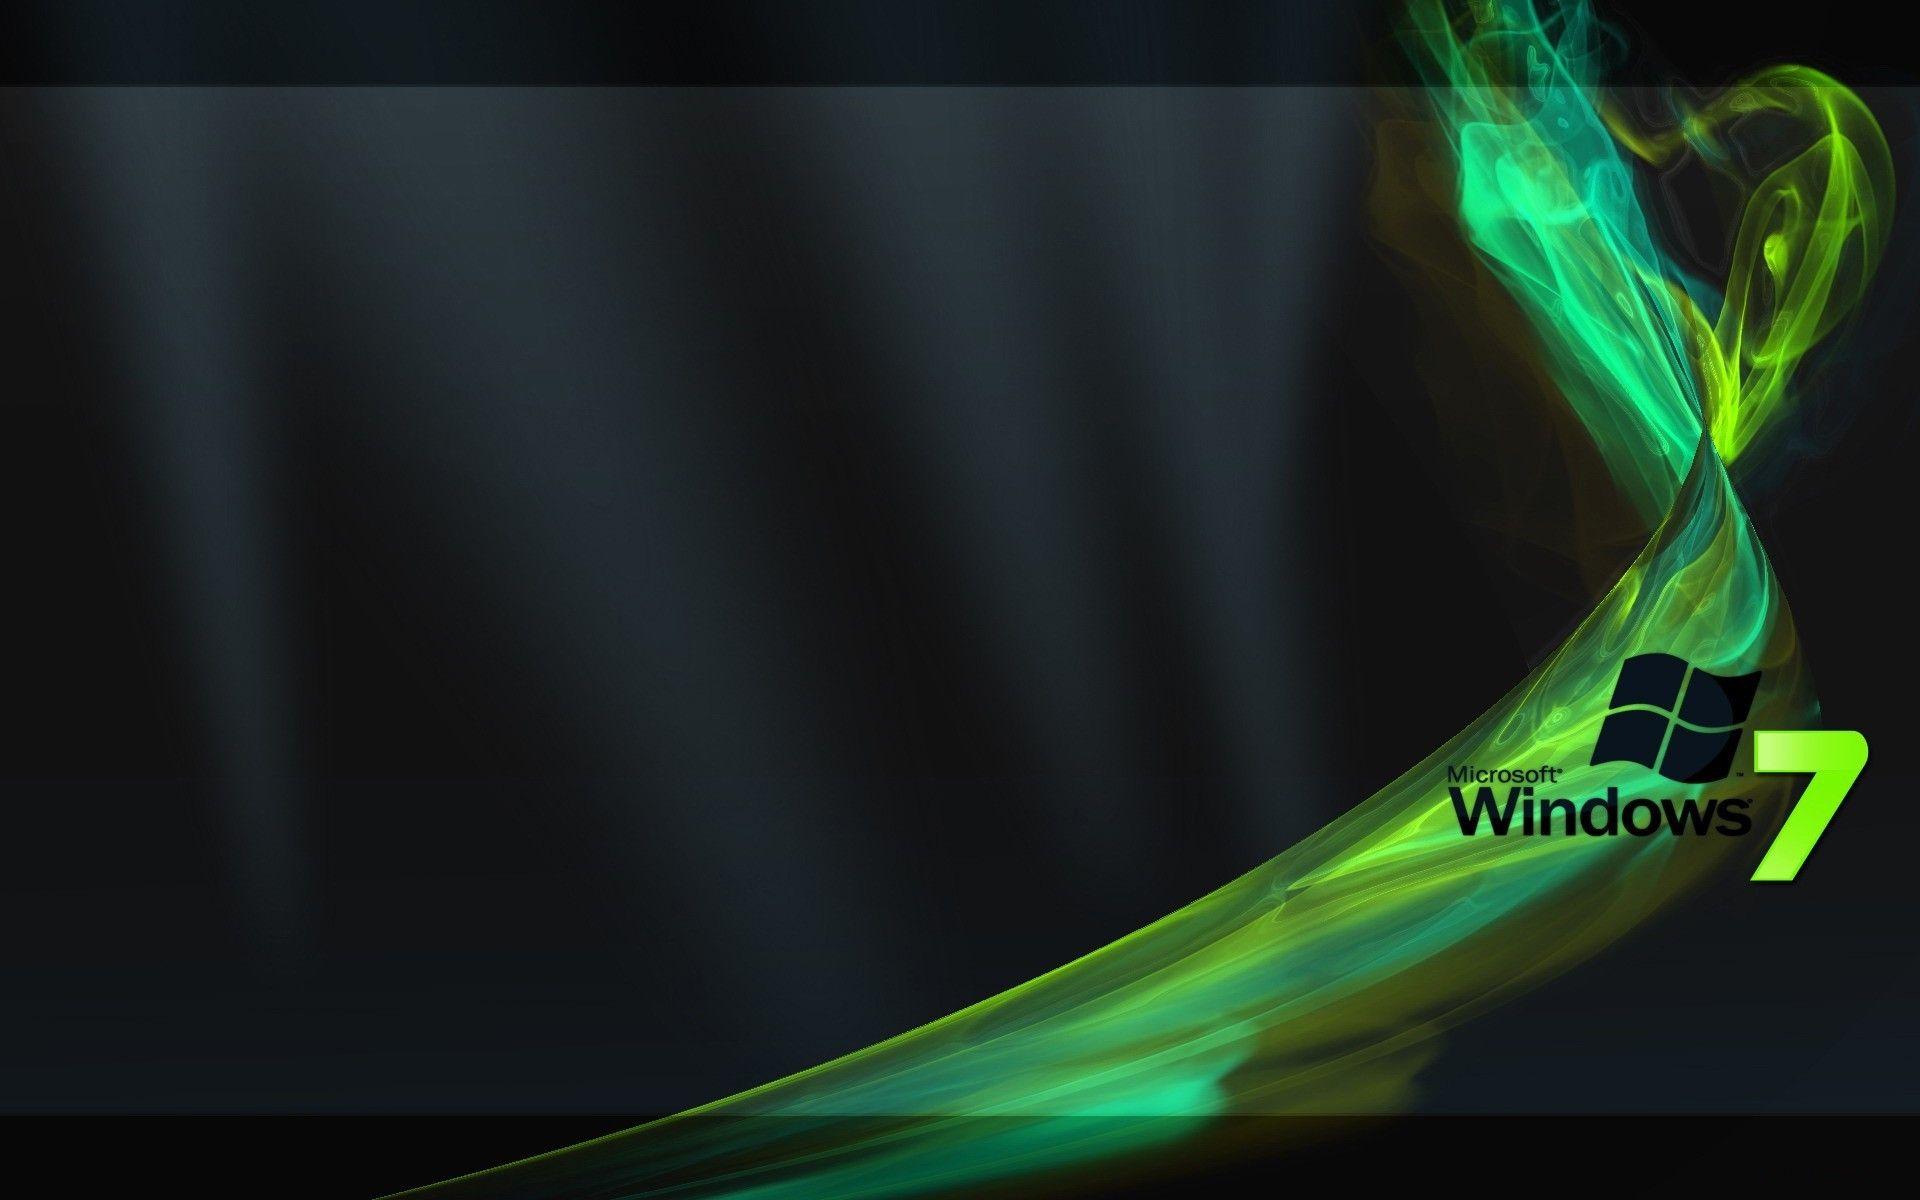 Full HD p Windows Wallpapers HD Desktop Backgrounds 1280800 1920x1200